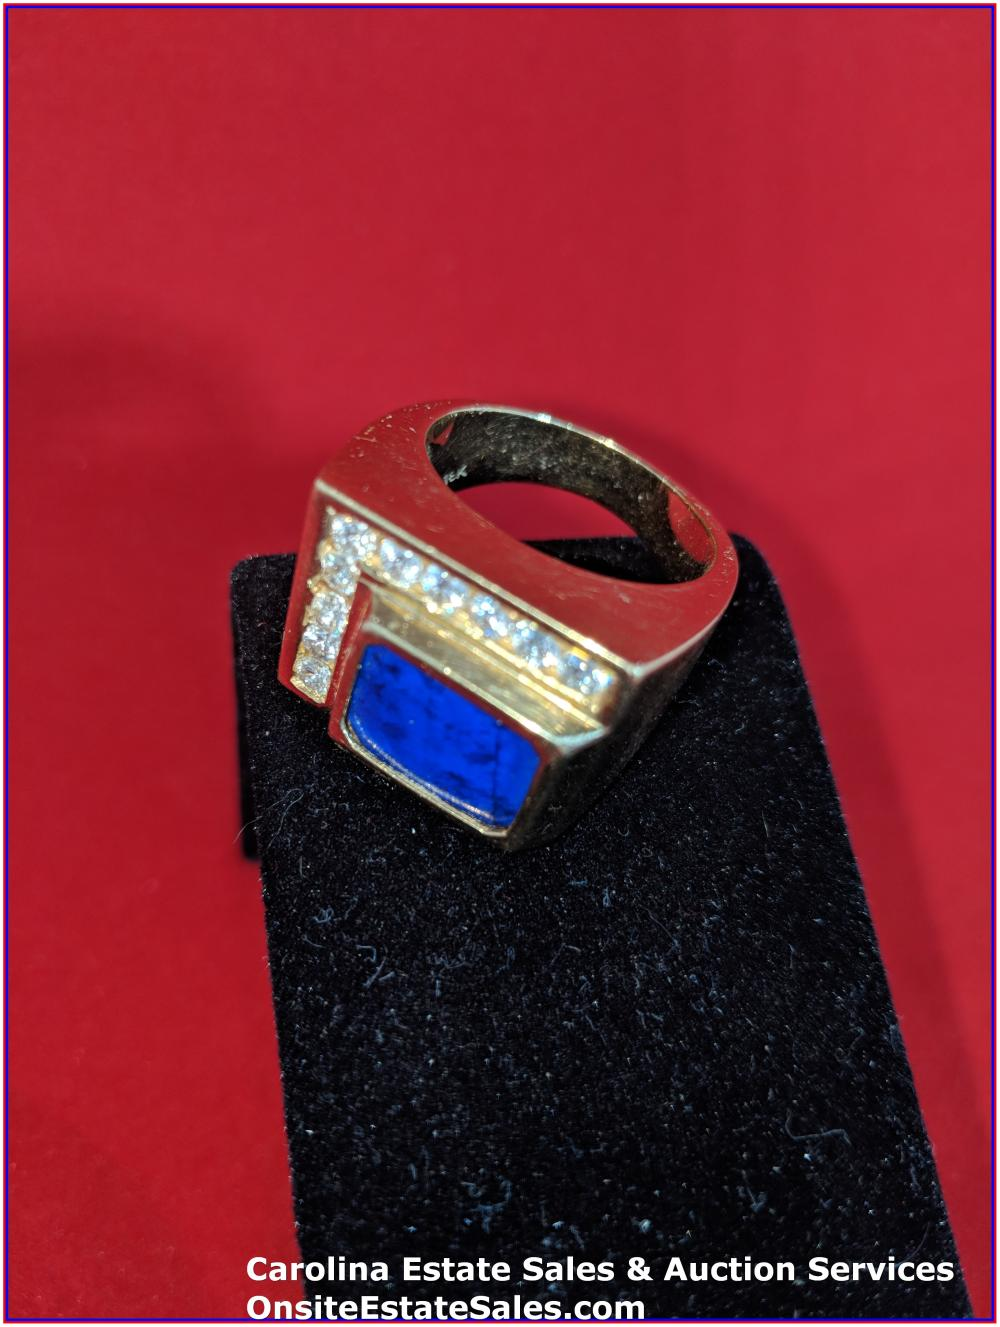 18K Gem Ring Gold 24 Grams Total Weight; Custom Lapis, 1.20 cts Diamonds